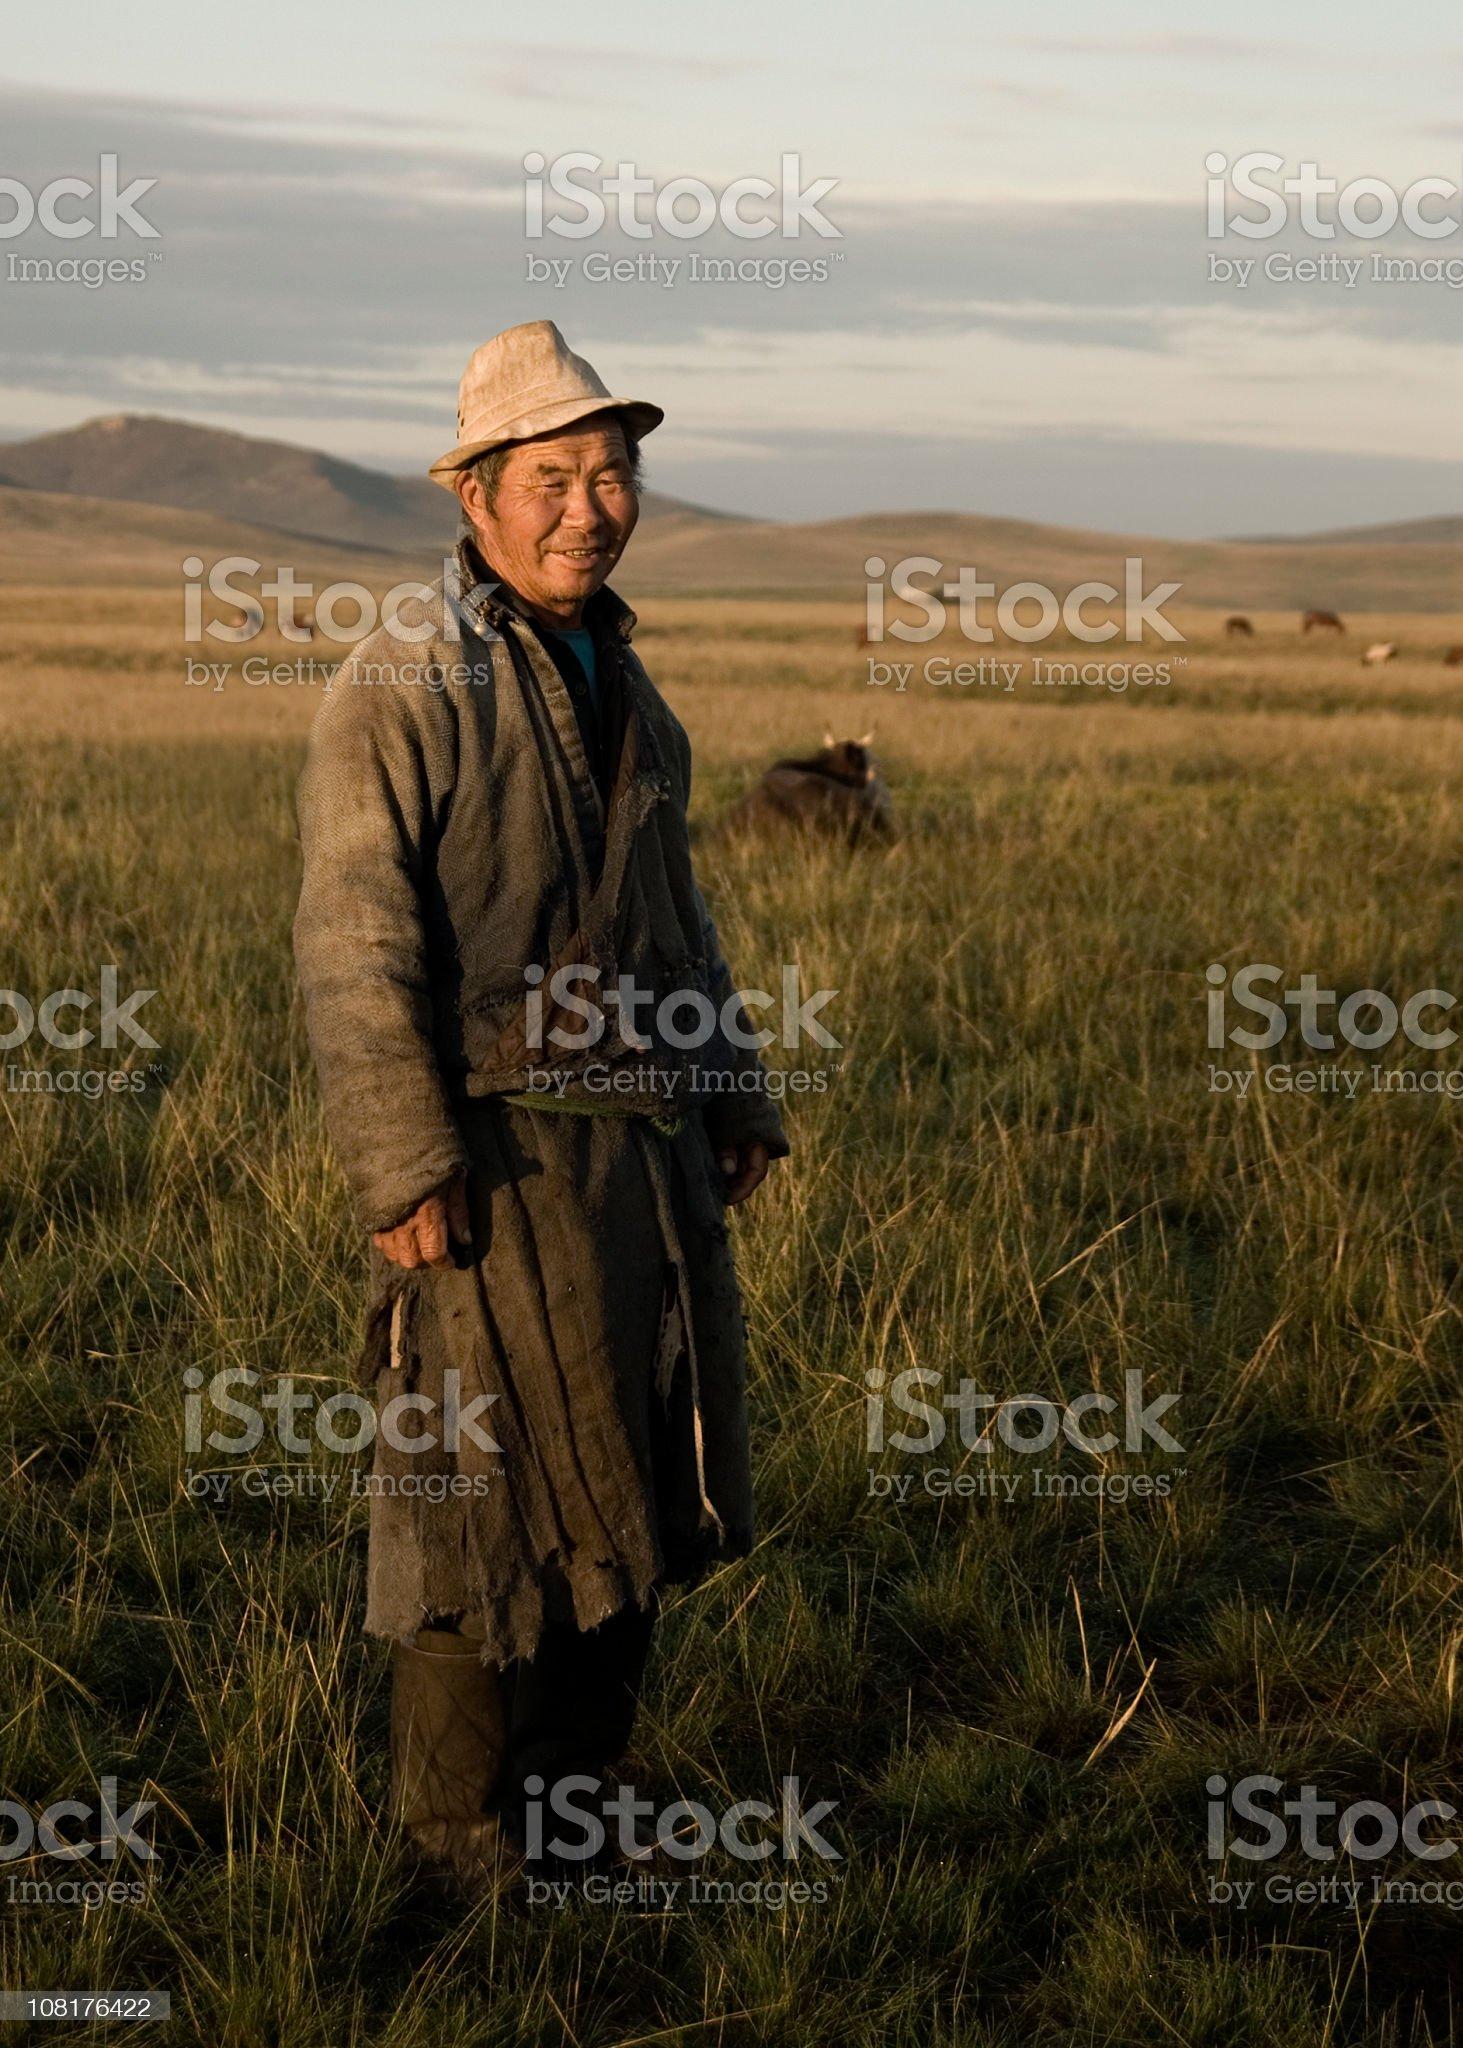 Asian Portraits royalty-free stock photo